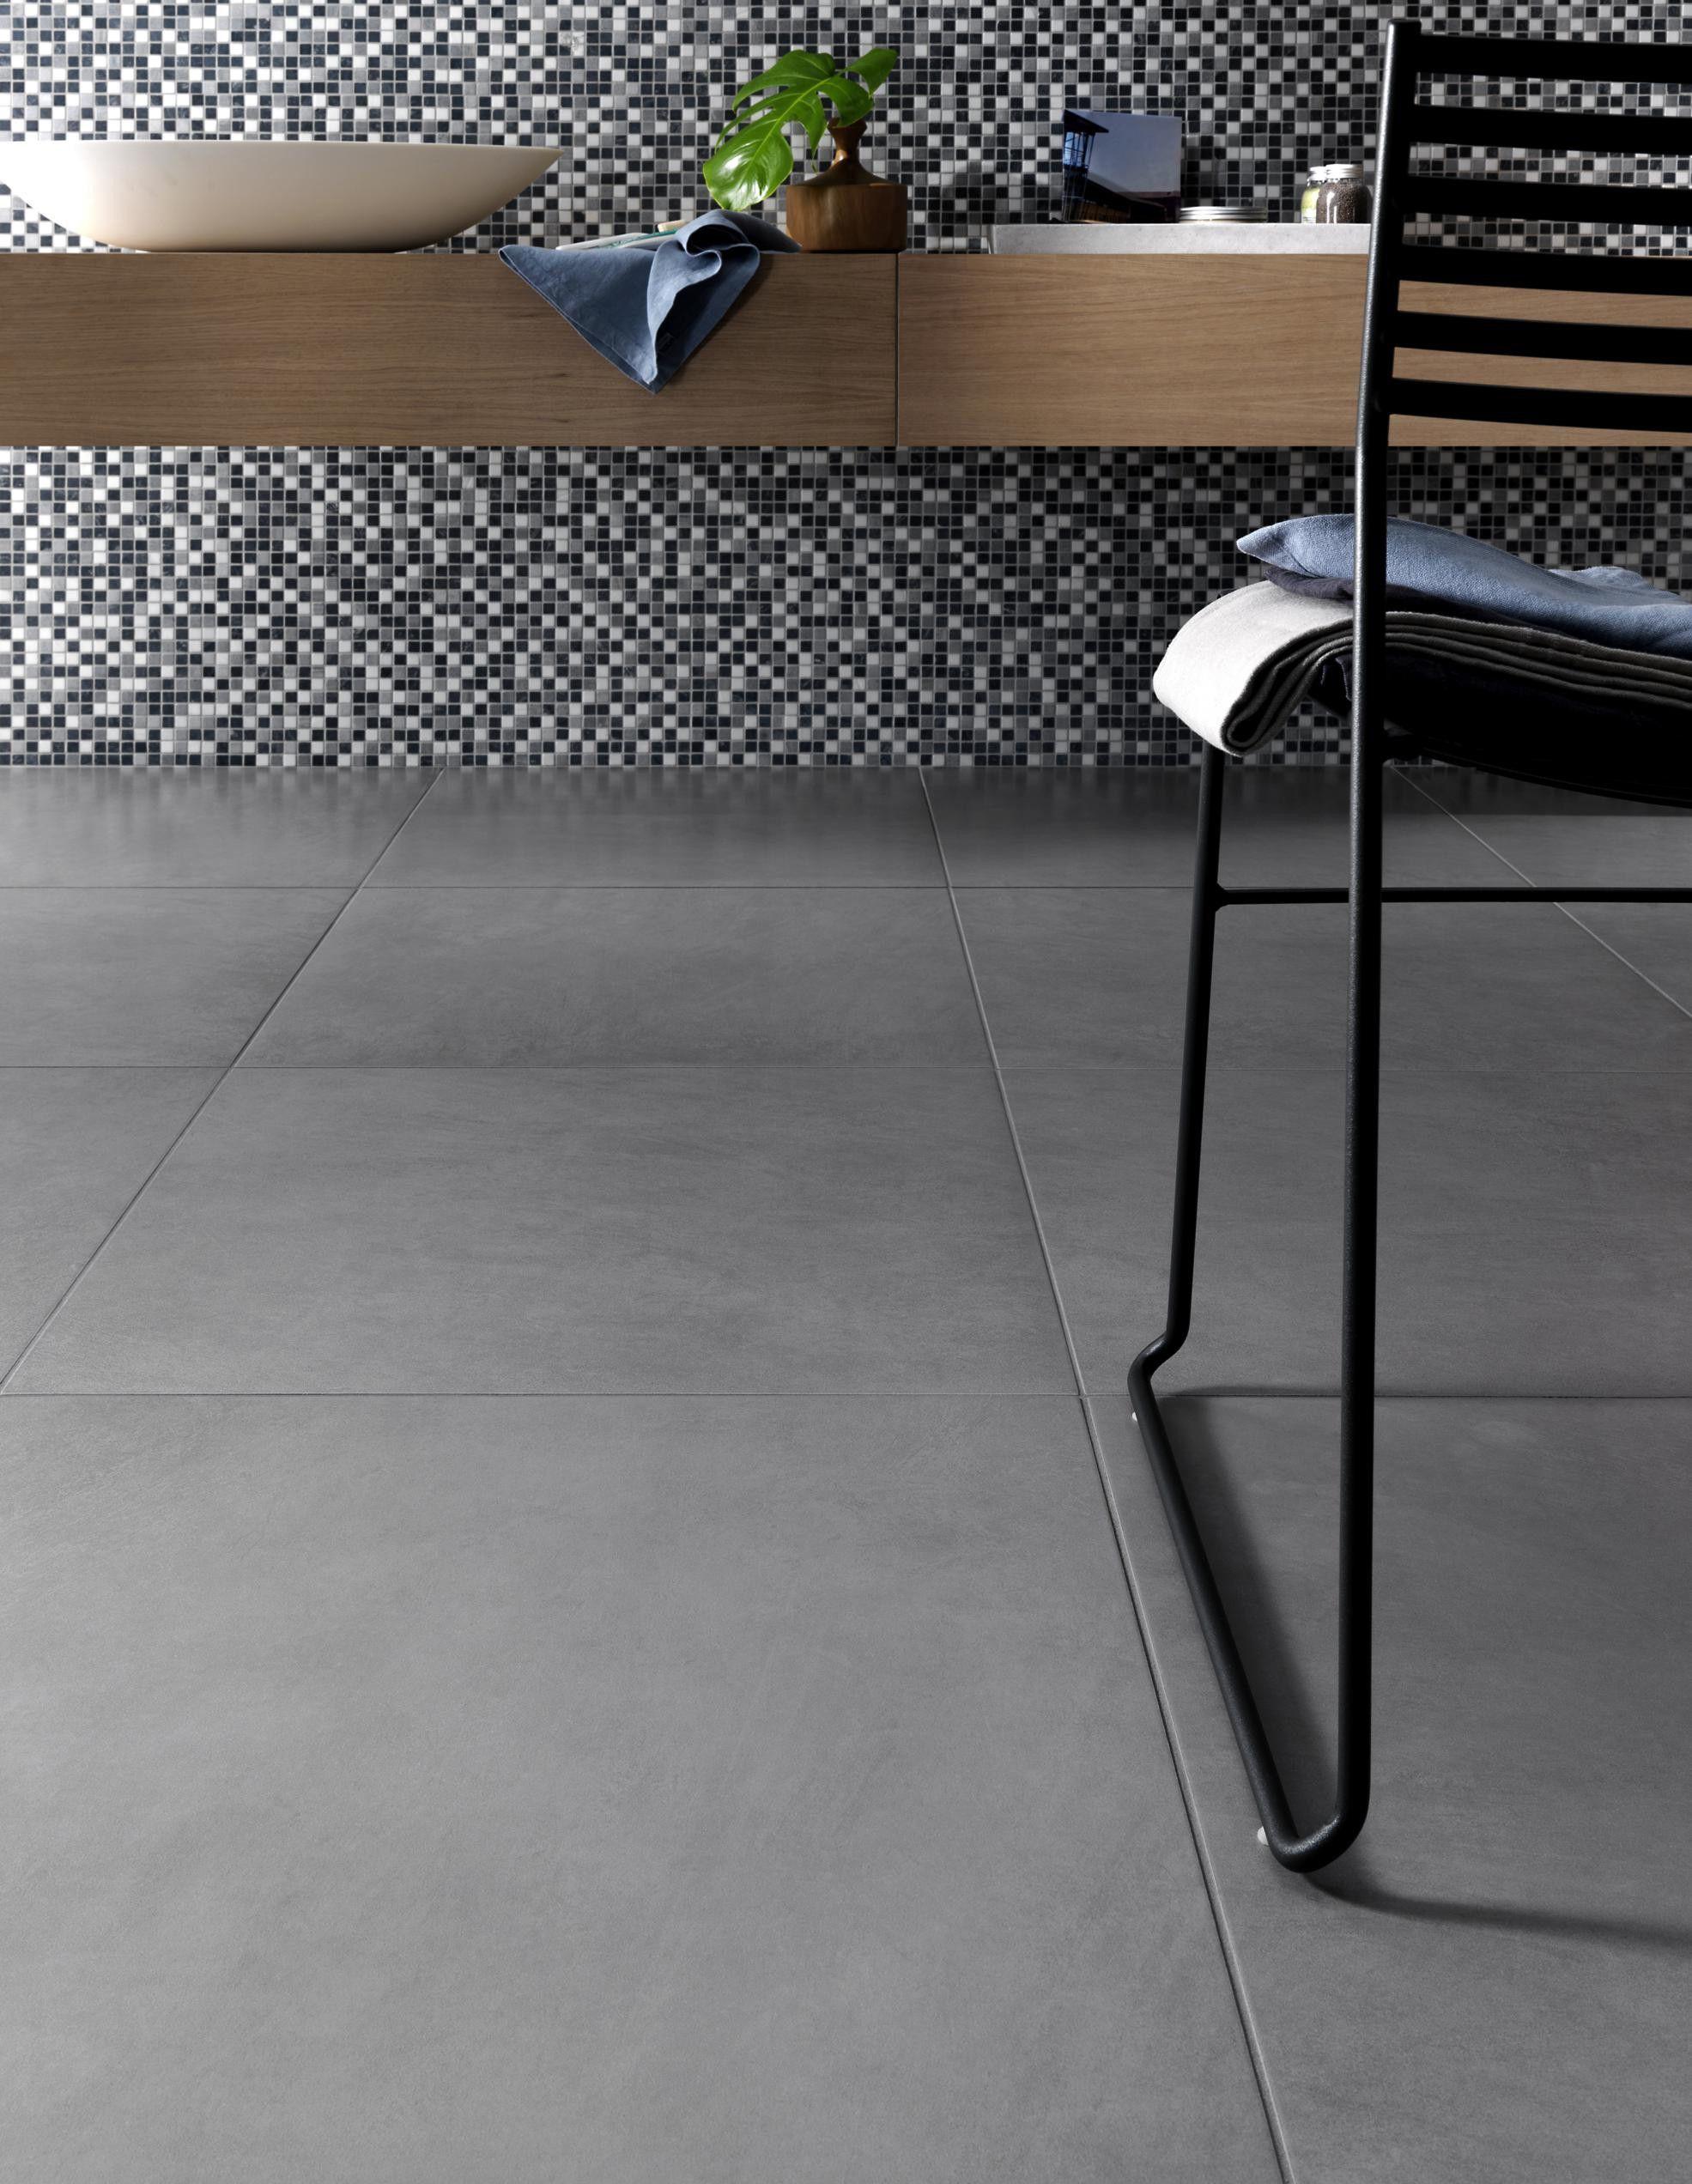 Astonishing Home Design With Eleganza Tile Ideas Eleganza Tile